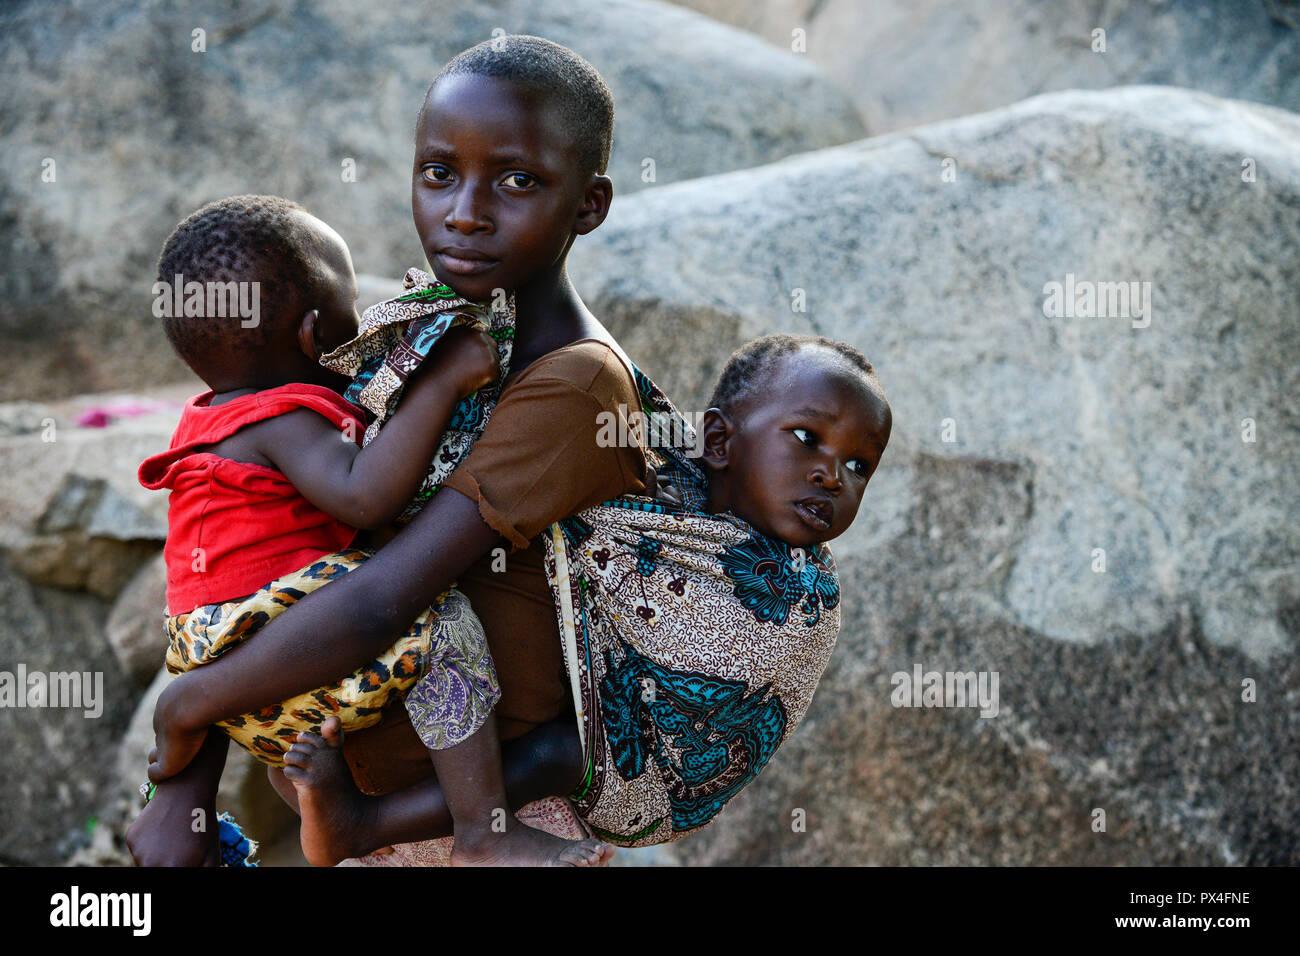 TTANZANIA, Mara Region, Musoma, village Bokabwa, Luo tribe, elder children must take care for their smaller siblings / Tansania Region Mara, Musoma, Dorf Bokabwa, Luo Volksstamm, Kinder - Stock Image